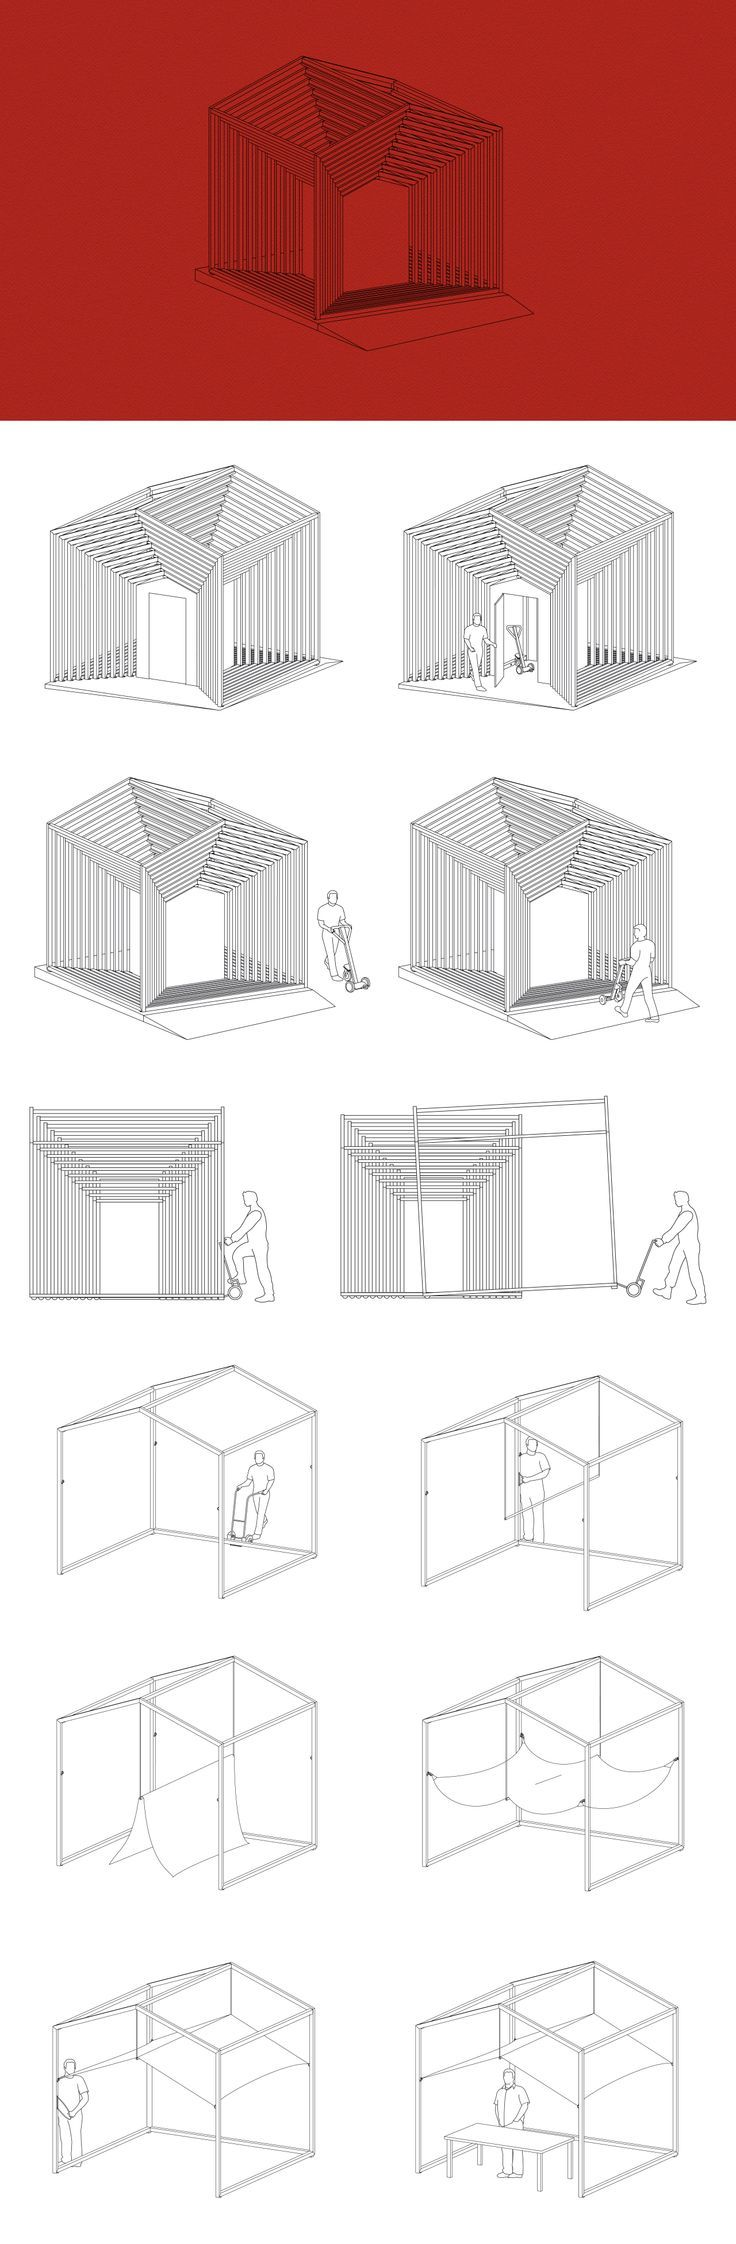 le cube gigogne mobilier urbain modulable saint etienne. Black Bedroom Furniture Sets. Home Design Ideas